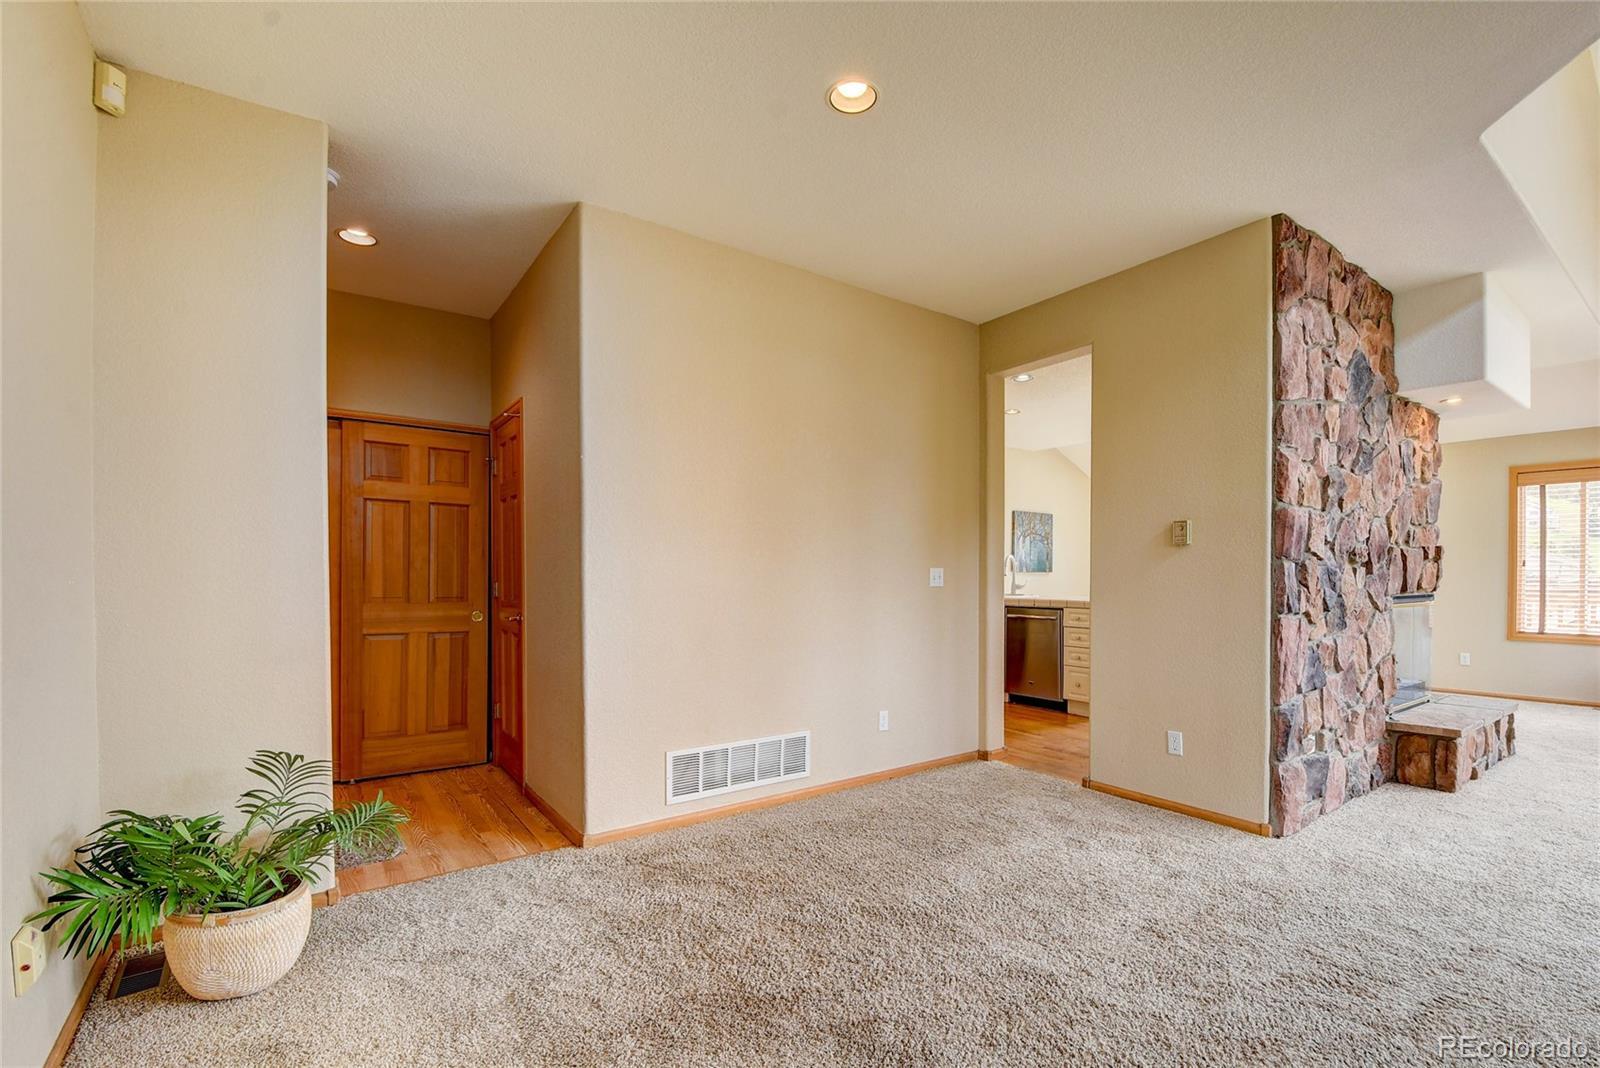 MLS# 2971781 - 12 - 784 Chimney Creek Drive #B, Golden, CO 80401